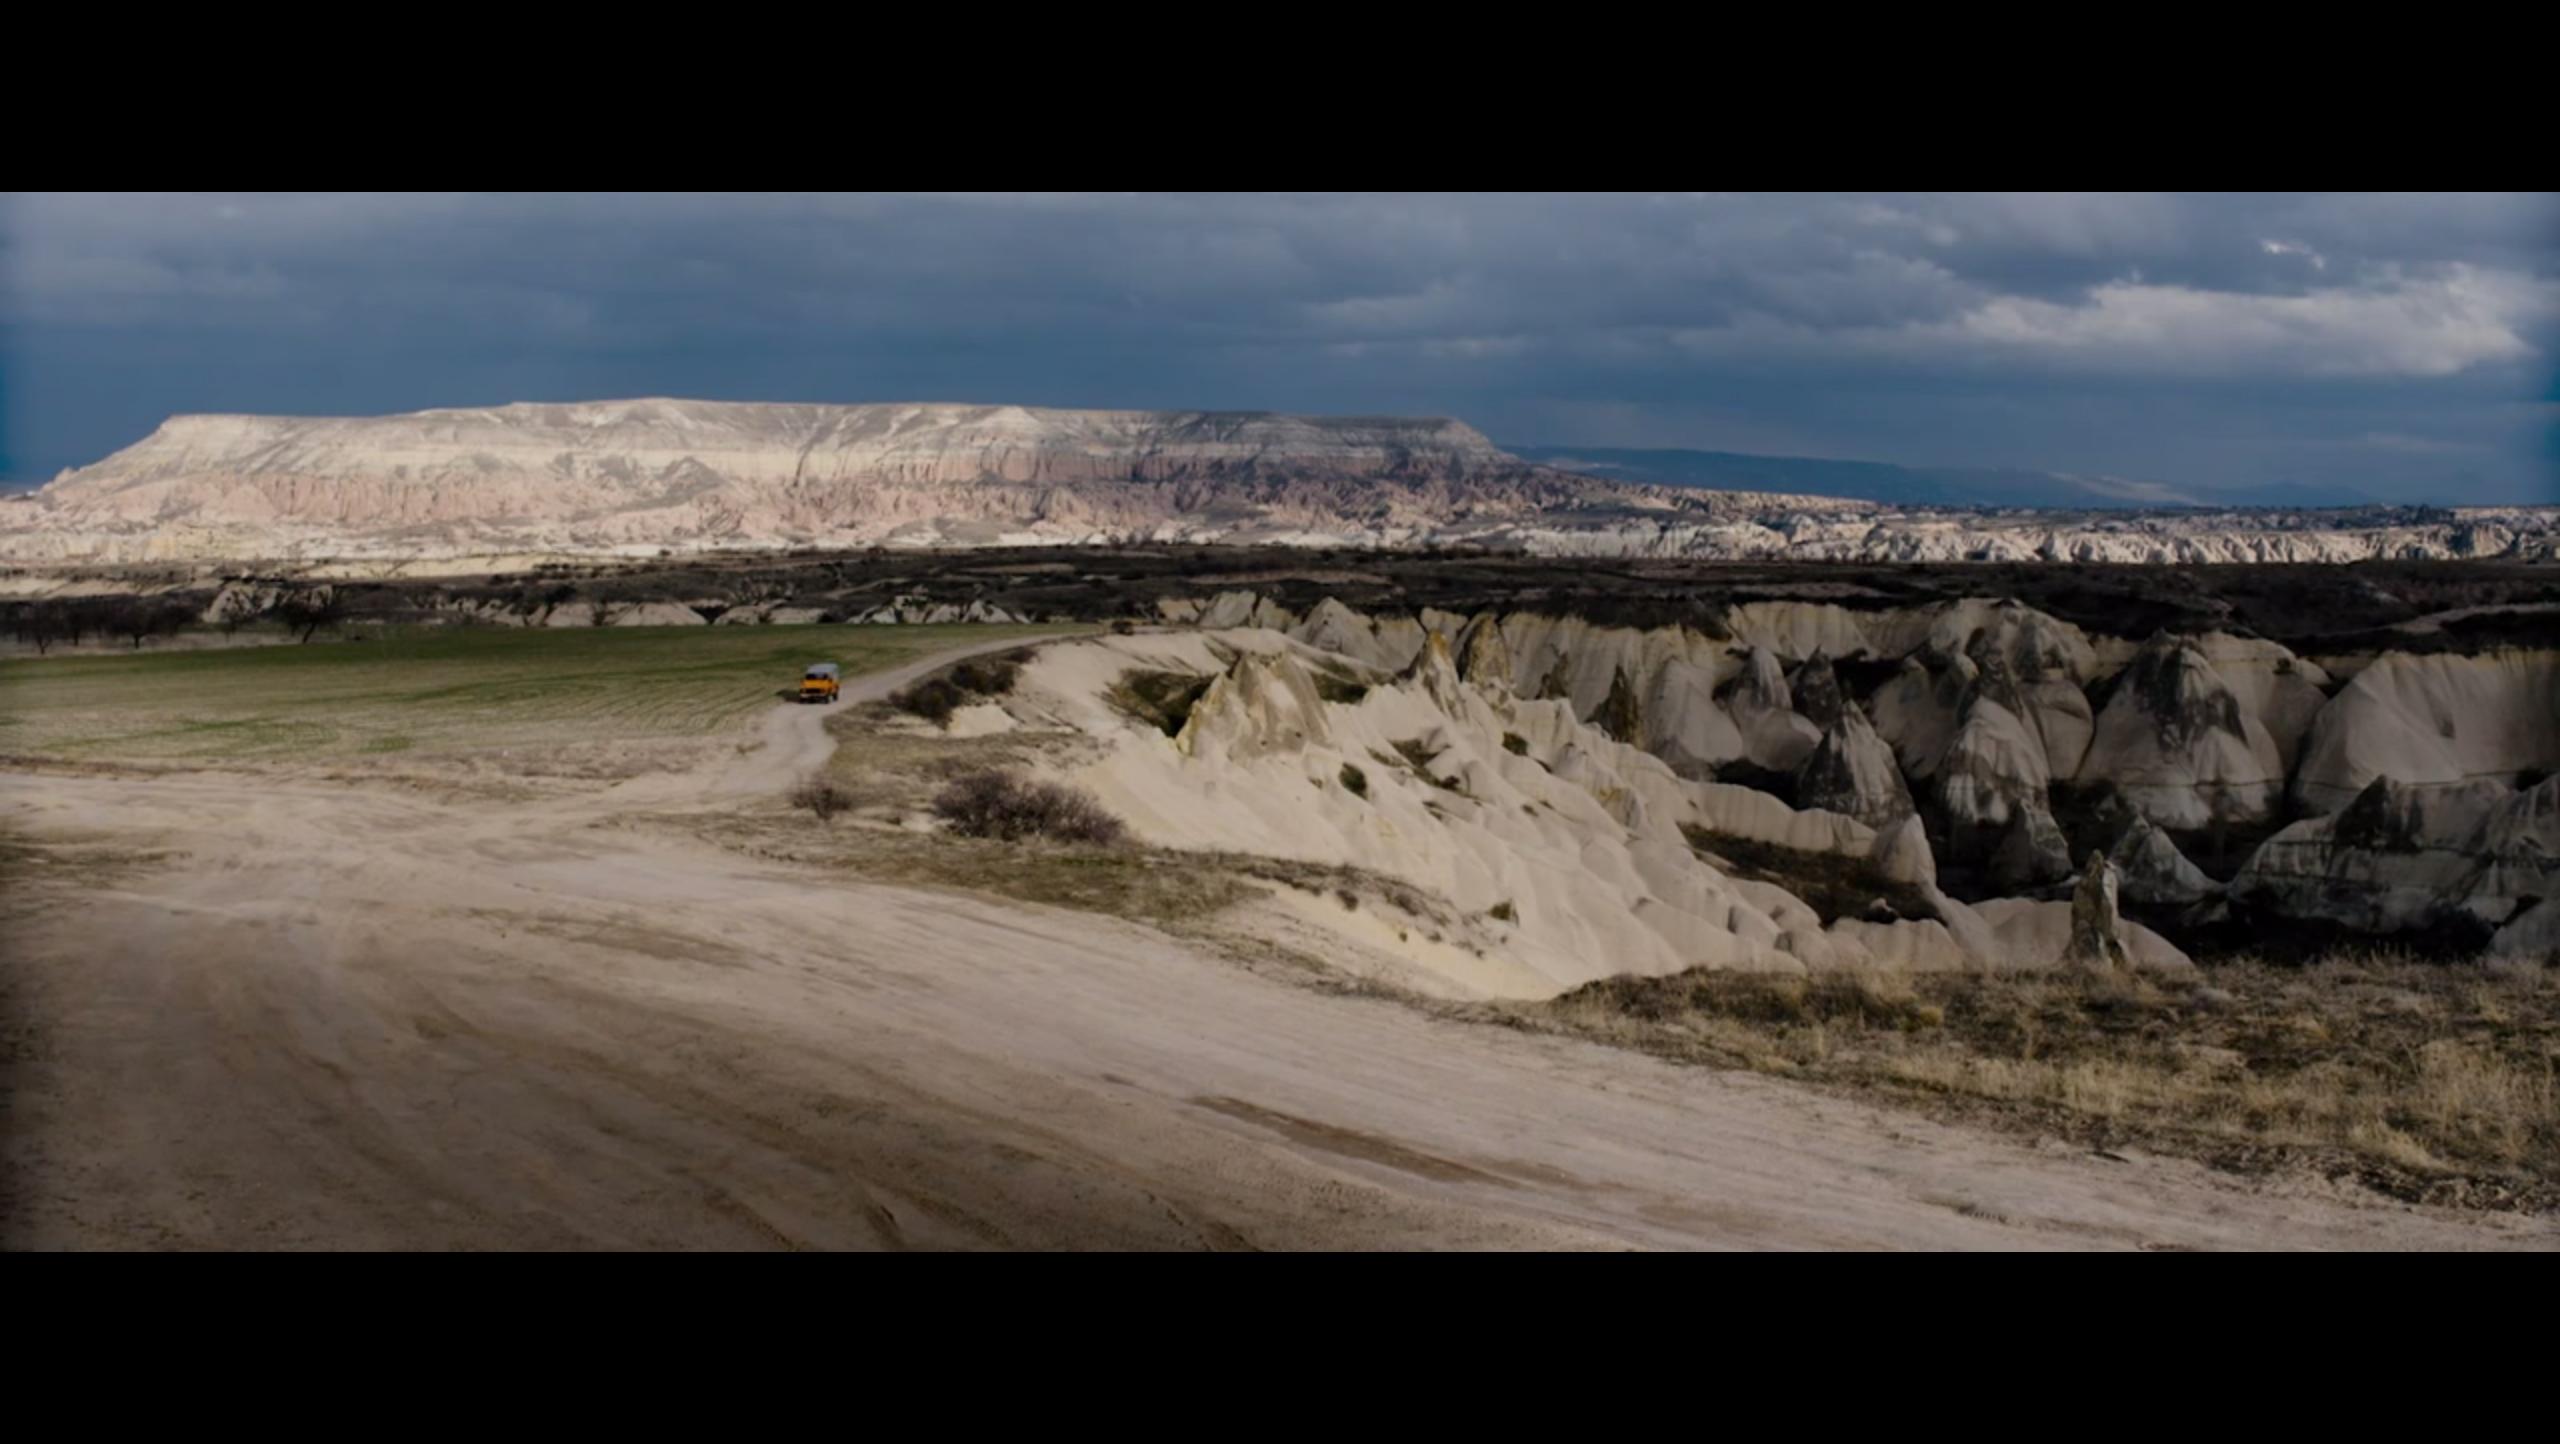 winterschlaf-film-screenshot-03_renk